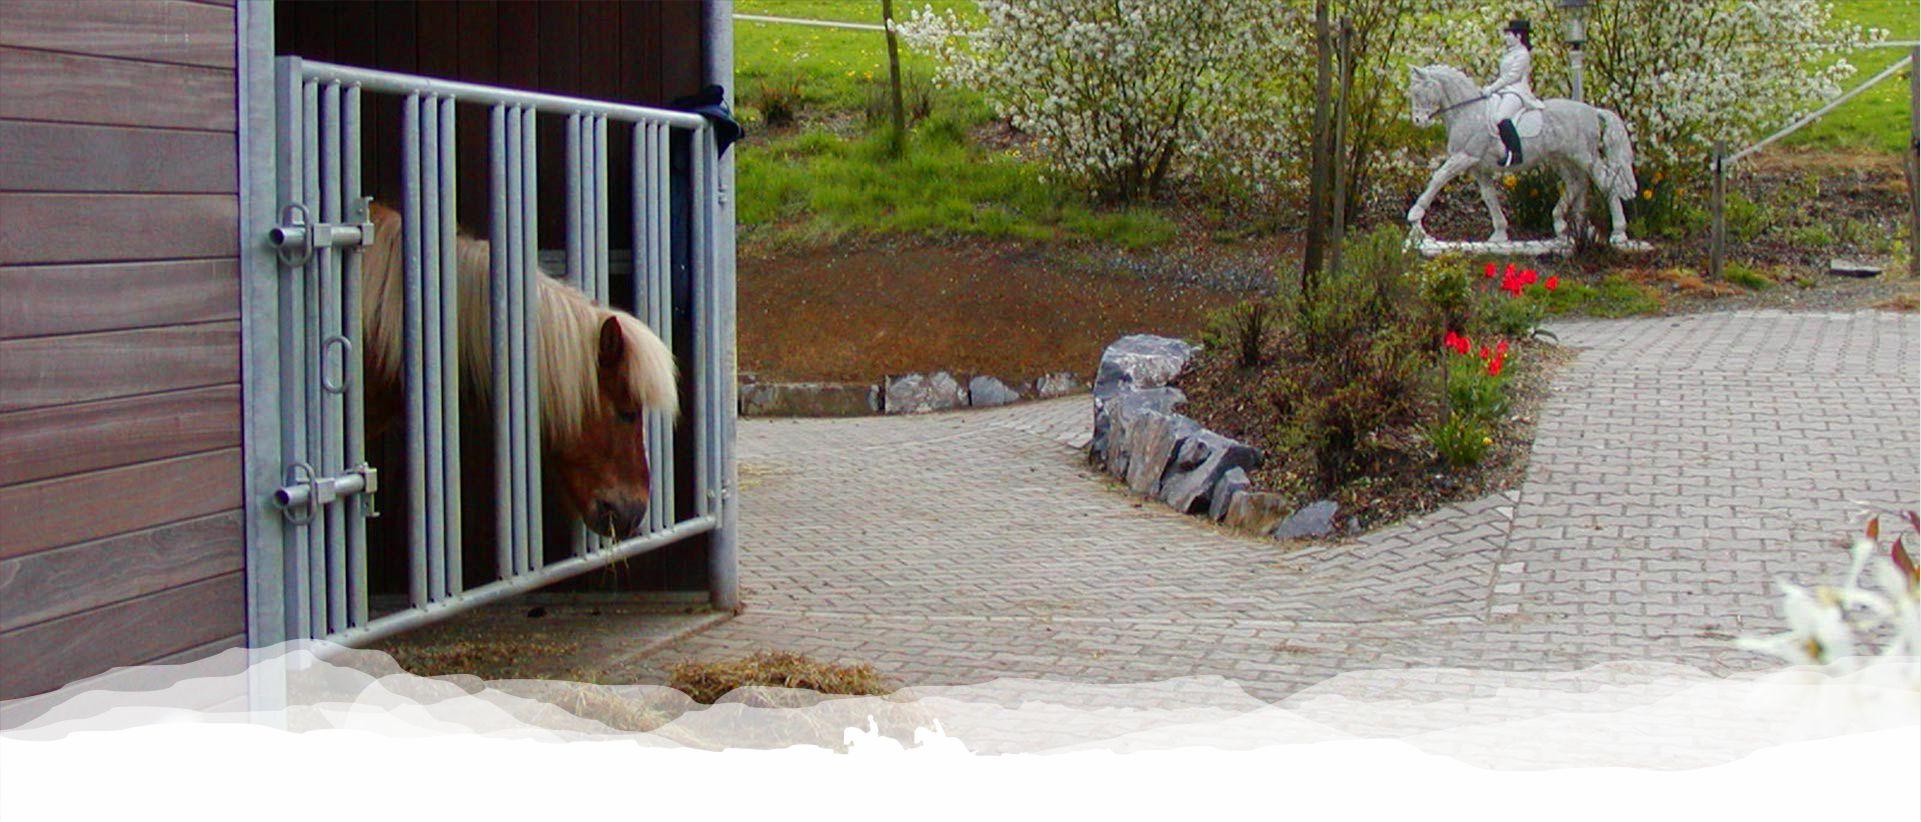 reitschule_berger_pferdeunterbringung_001